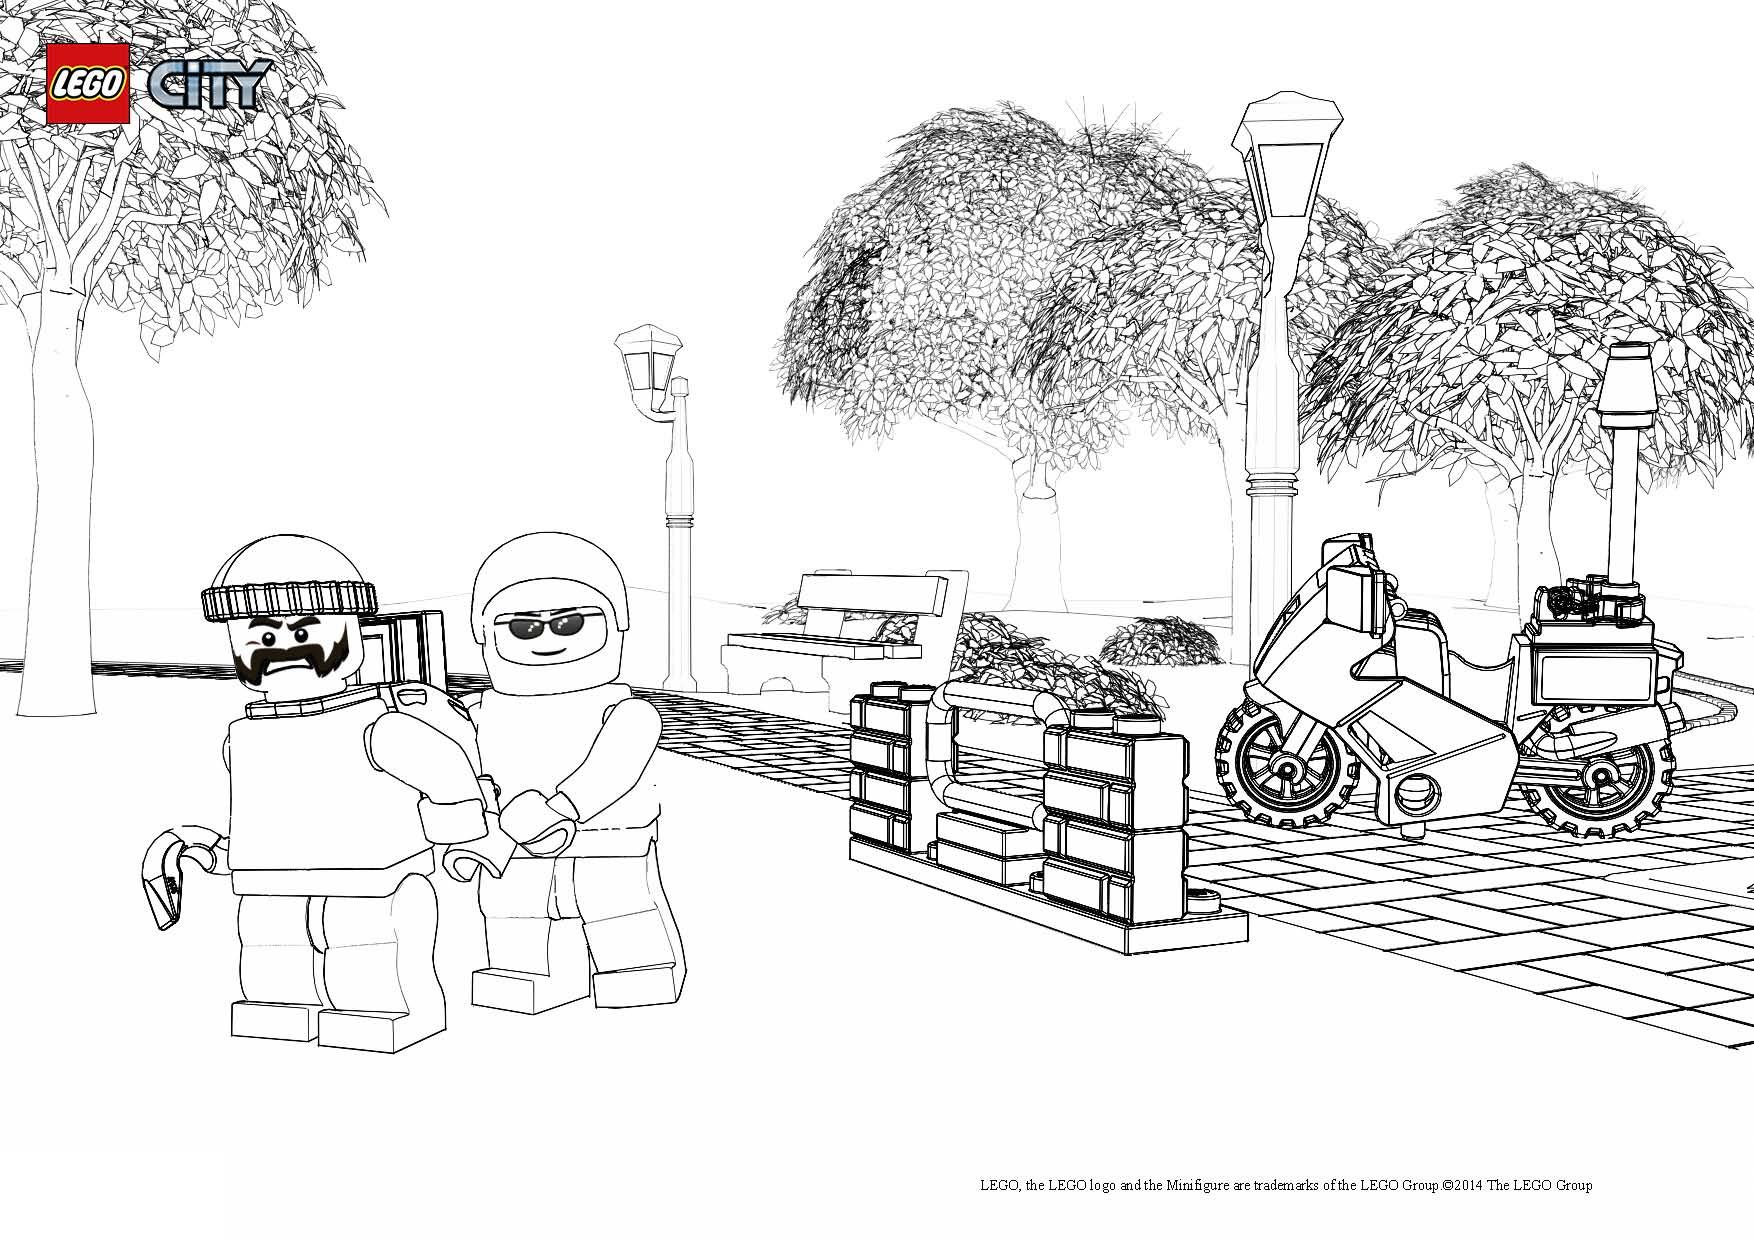 dessin de lego city a imprimer